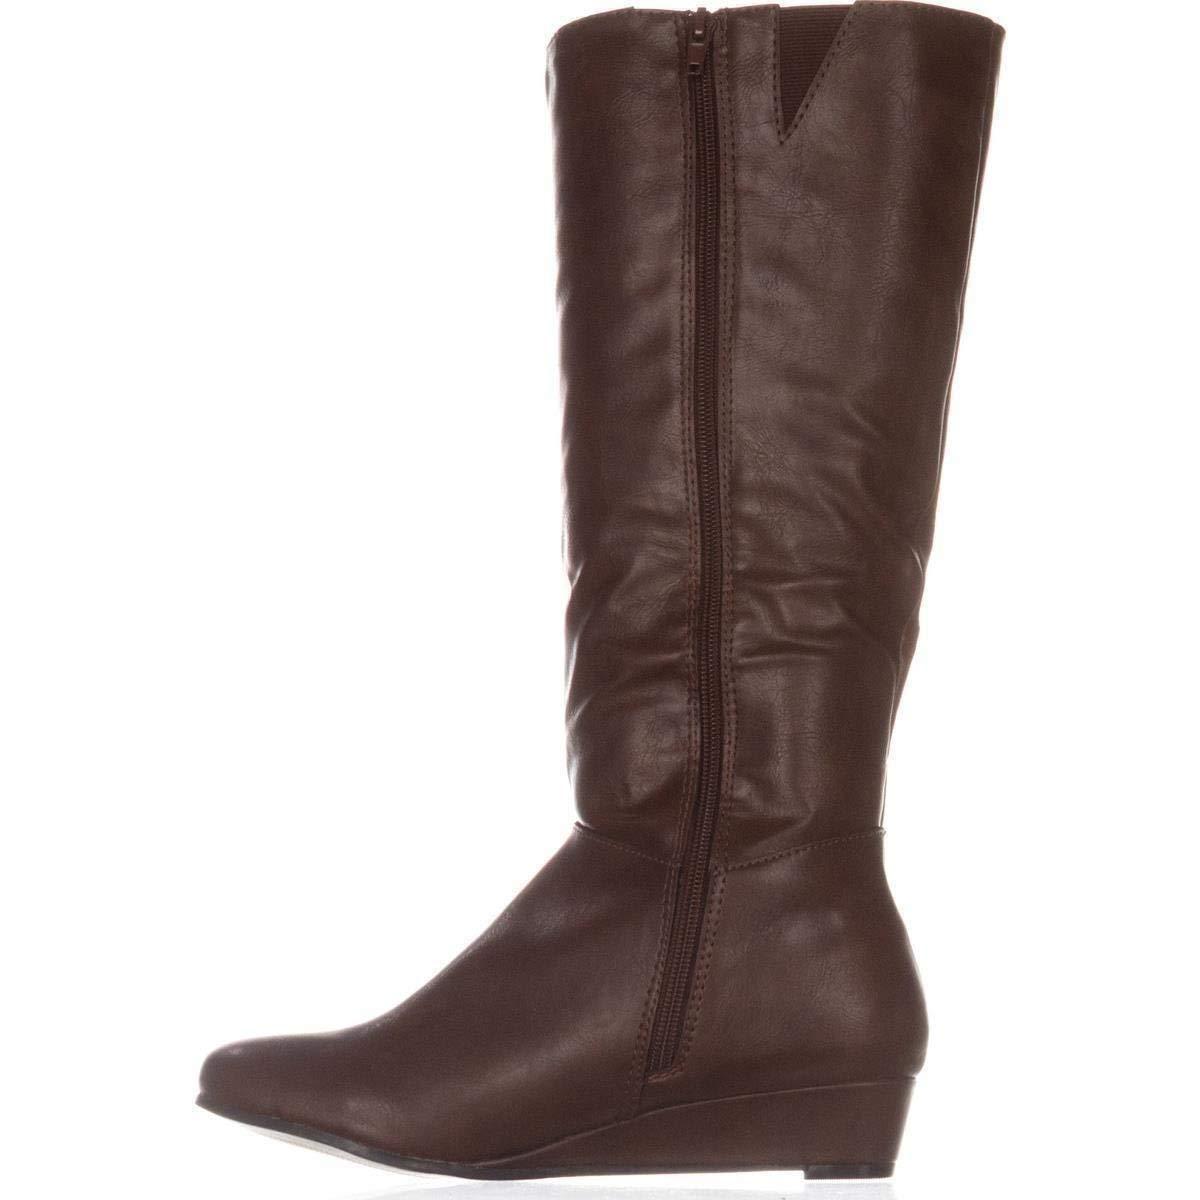 Style & Co. Womens Rainne Closed Toe Mid-Calf Fashion Boots, Cognac, Size 8.0